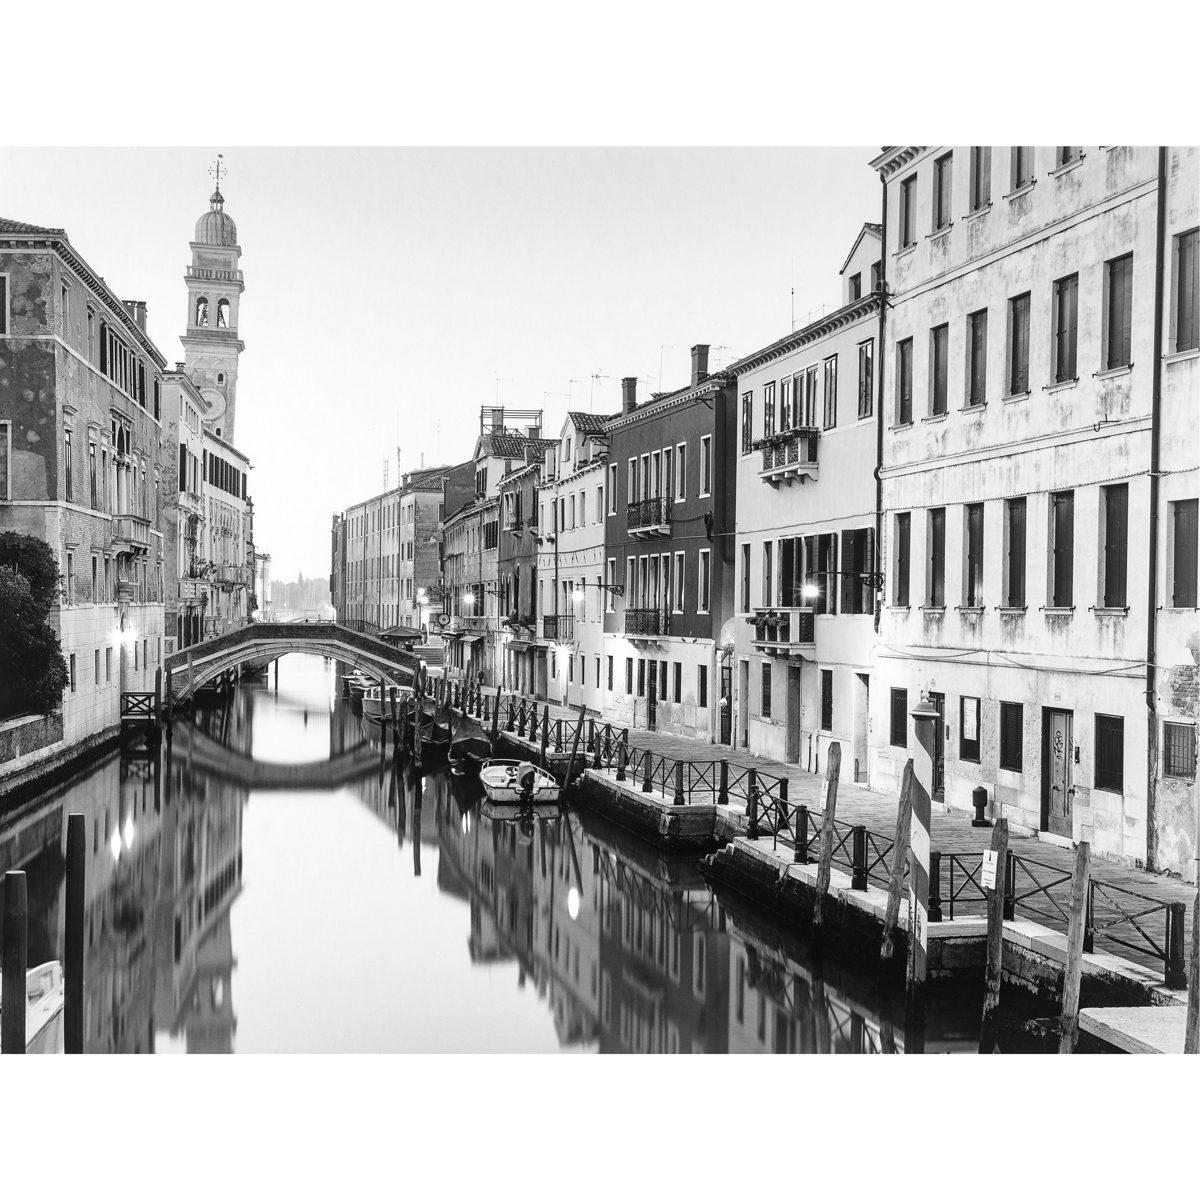 2016 Arca Swiss 4x5 Venice Italy MGFB Classic 1K